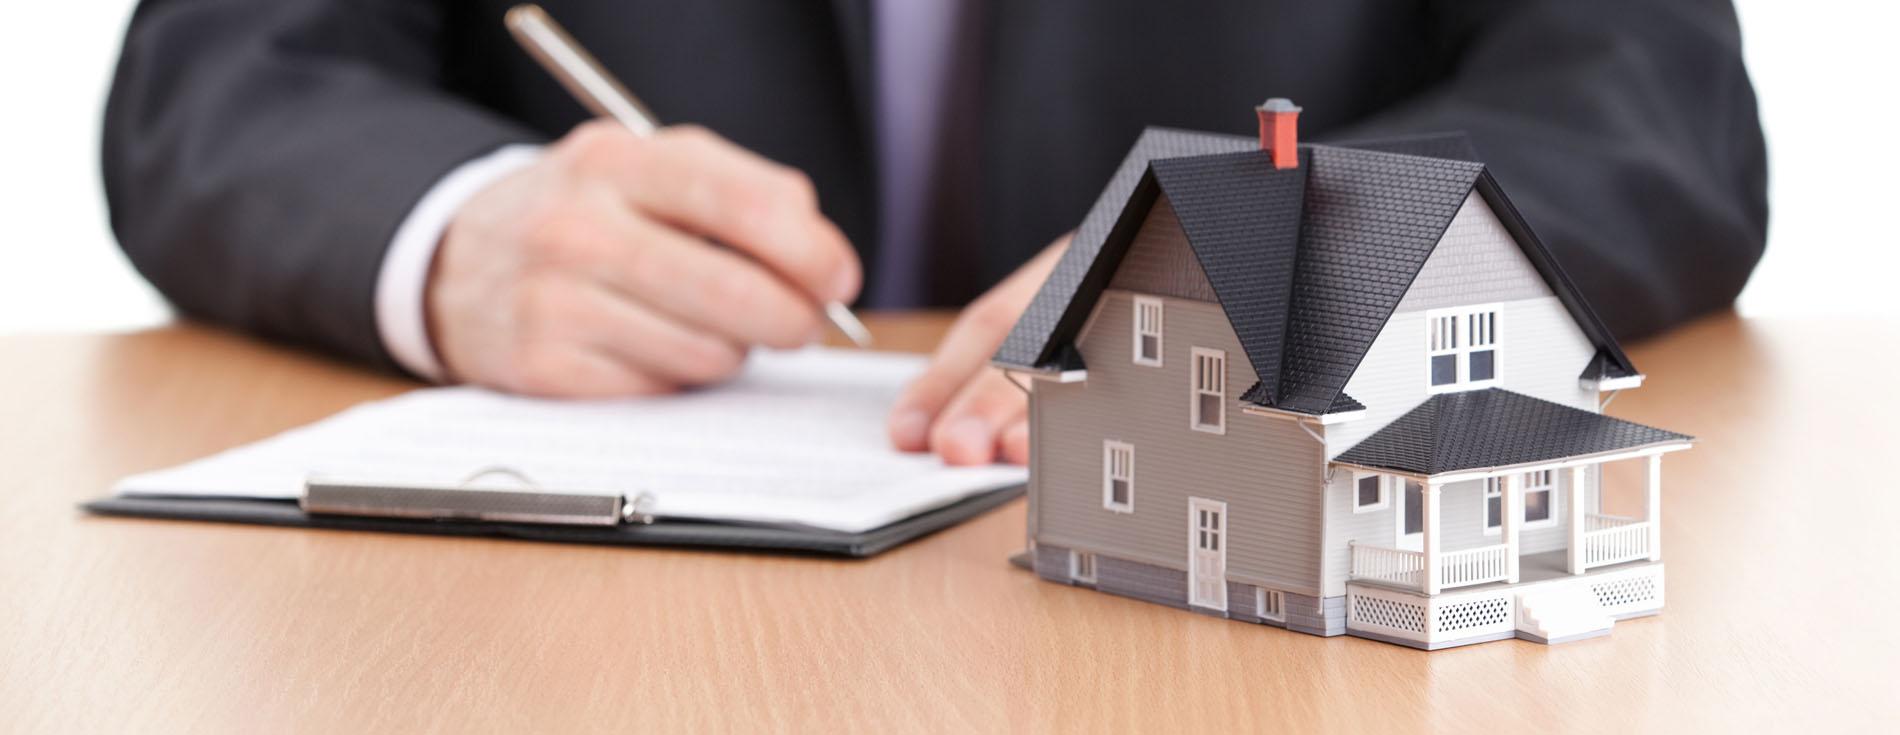 Real Estate Litigation Law Firm Los Angeles